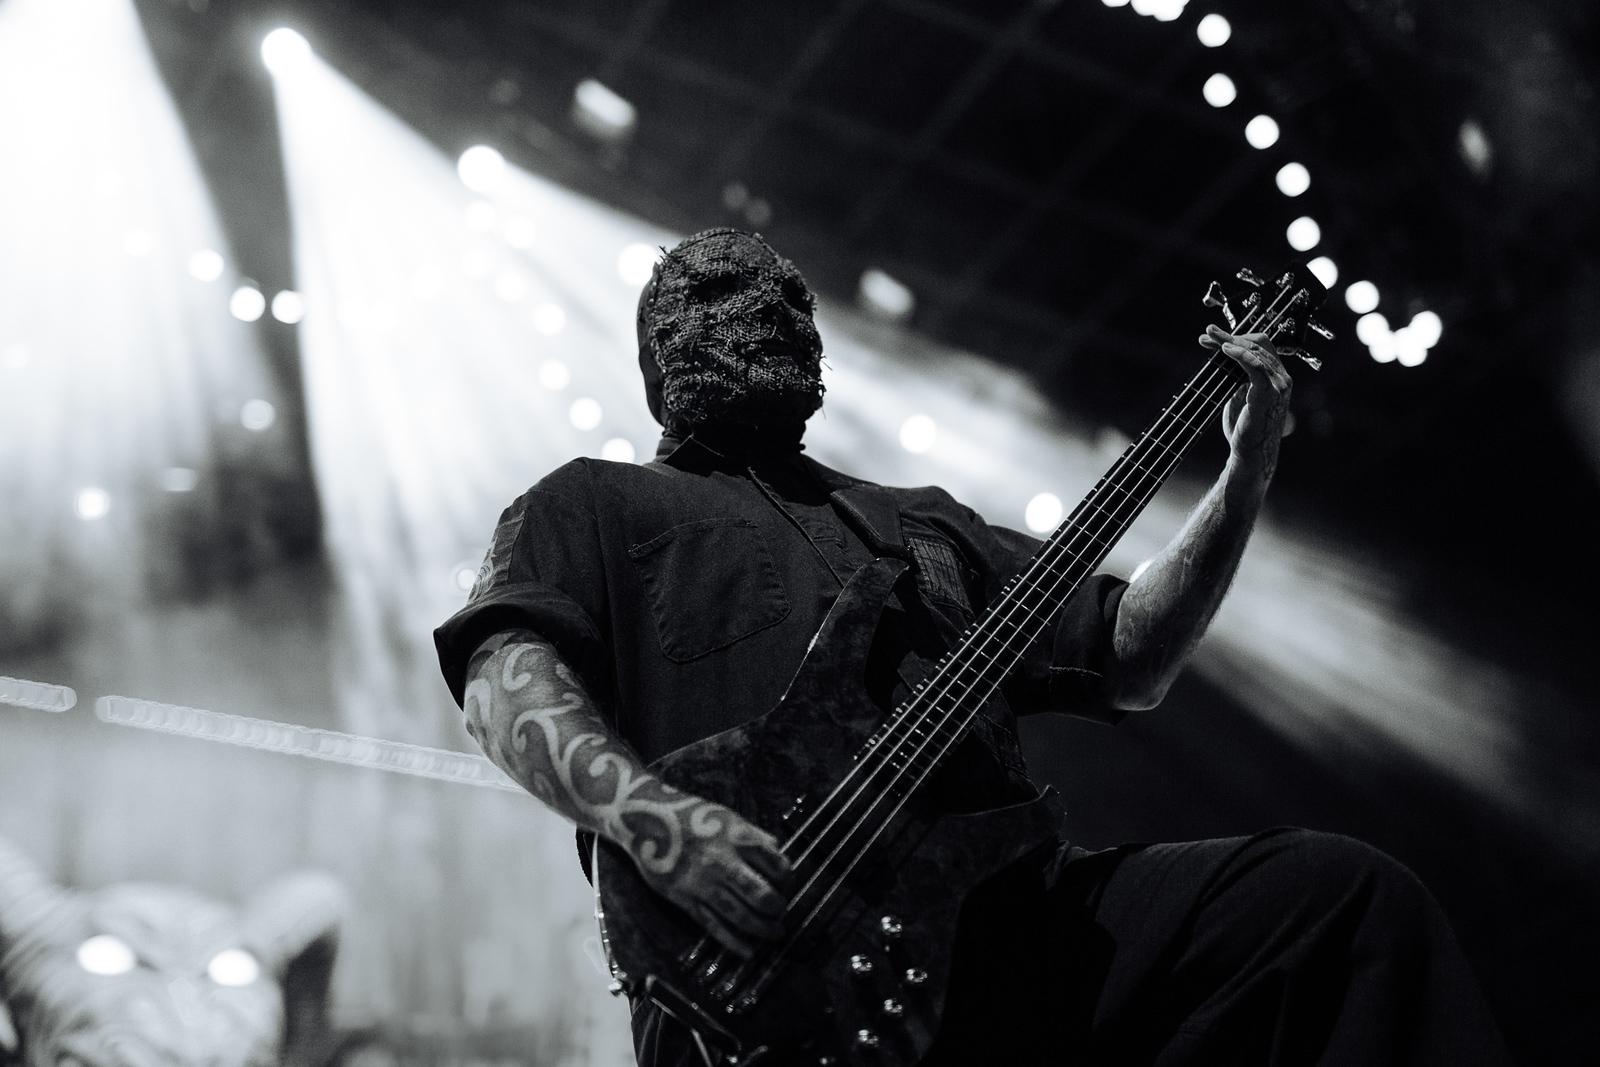 Alessandro Venturella of Slipknot by Adam Elmakias - Knofest 2015